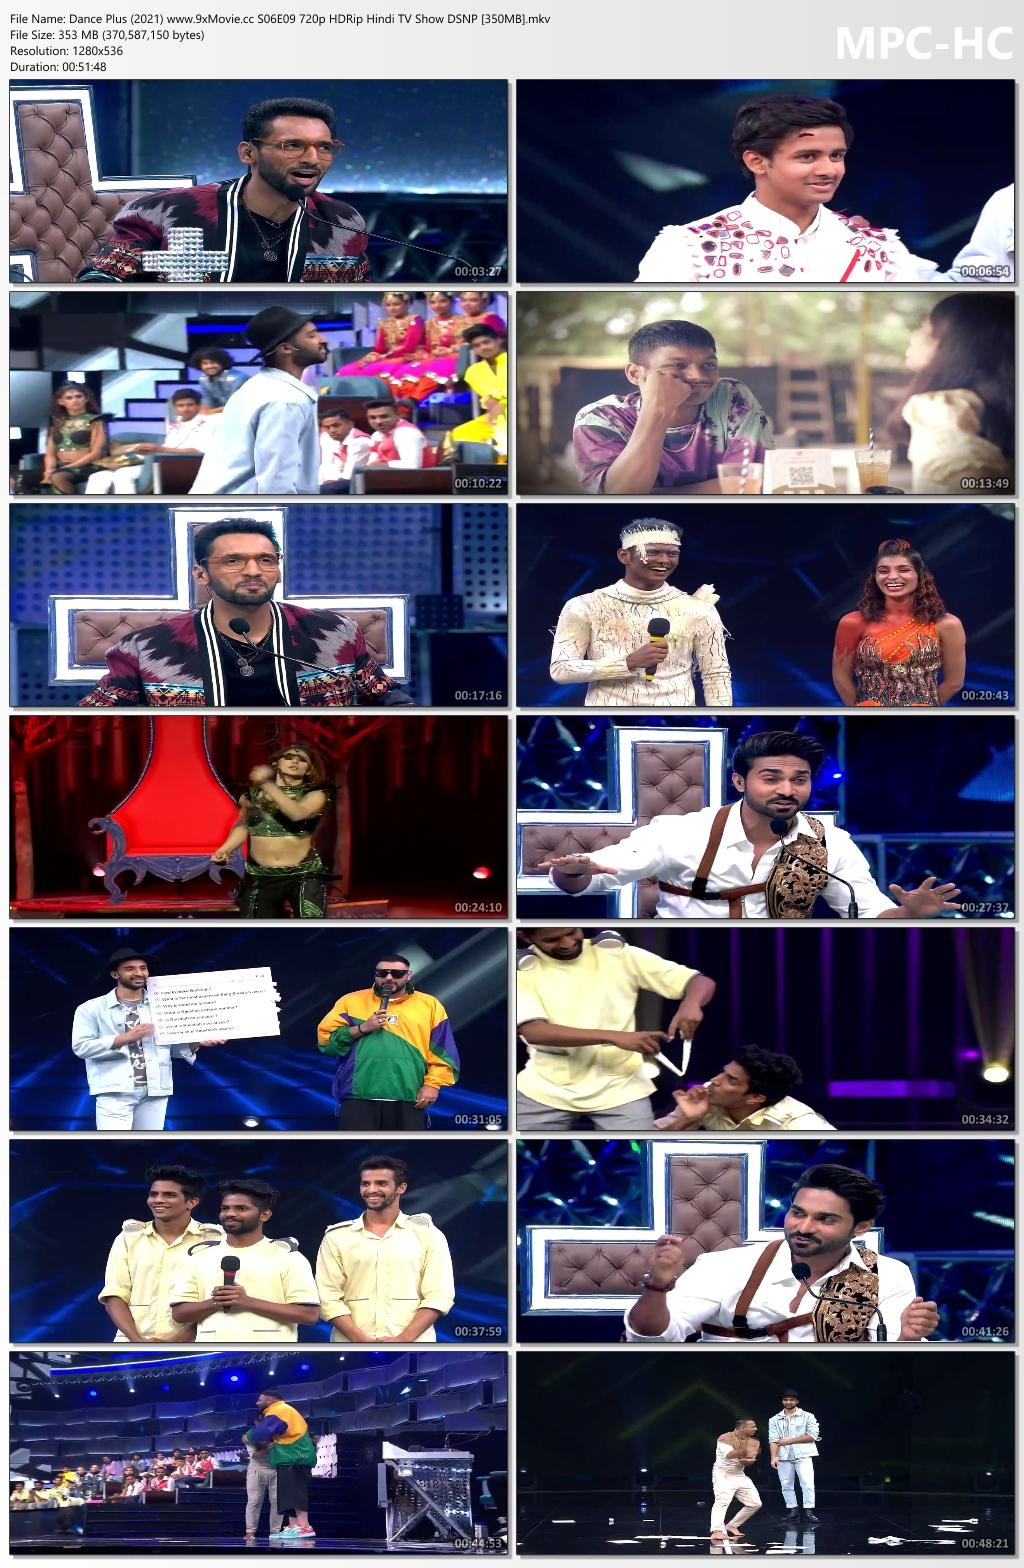 Dance-Plus-2021-www-9x-Movie-cc-S06-E09-720p-HDRip-Hindi-TV-Show-DSNP-350-MB-mkv